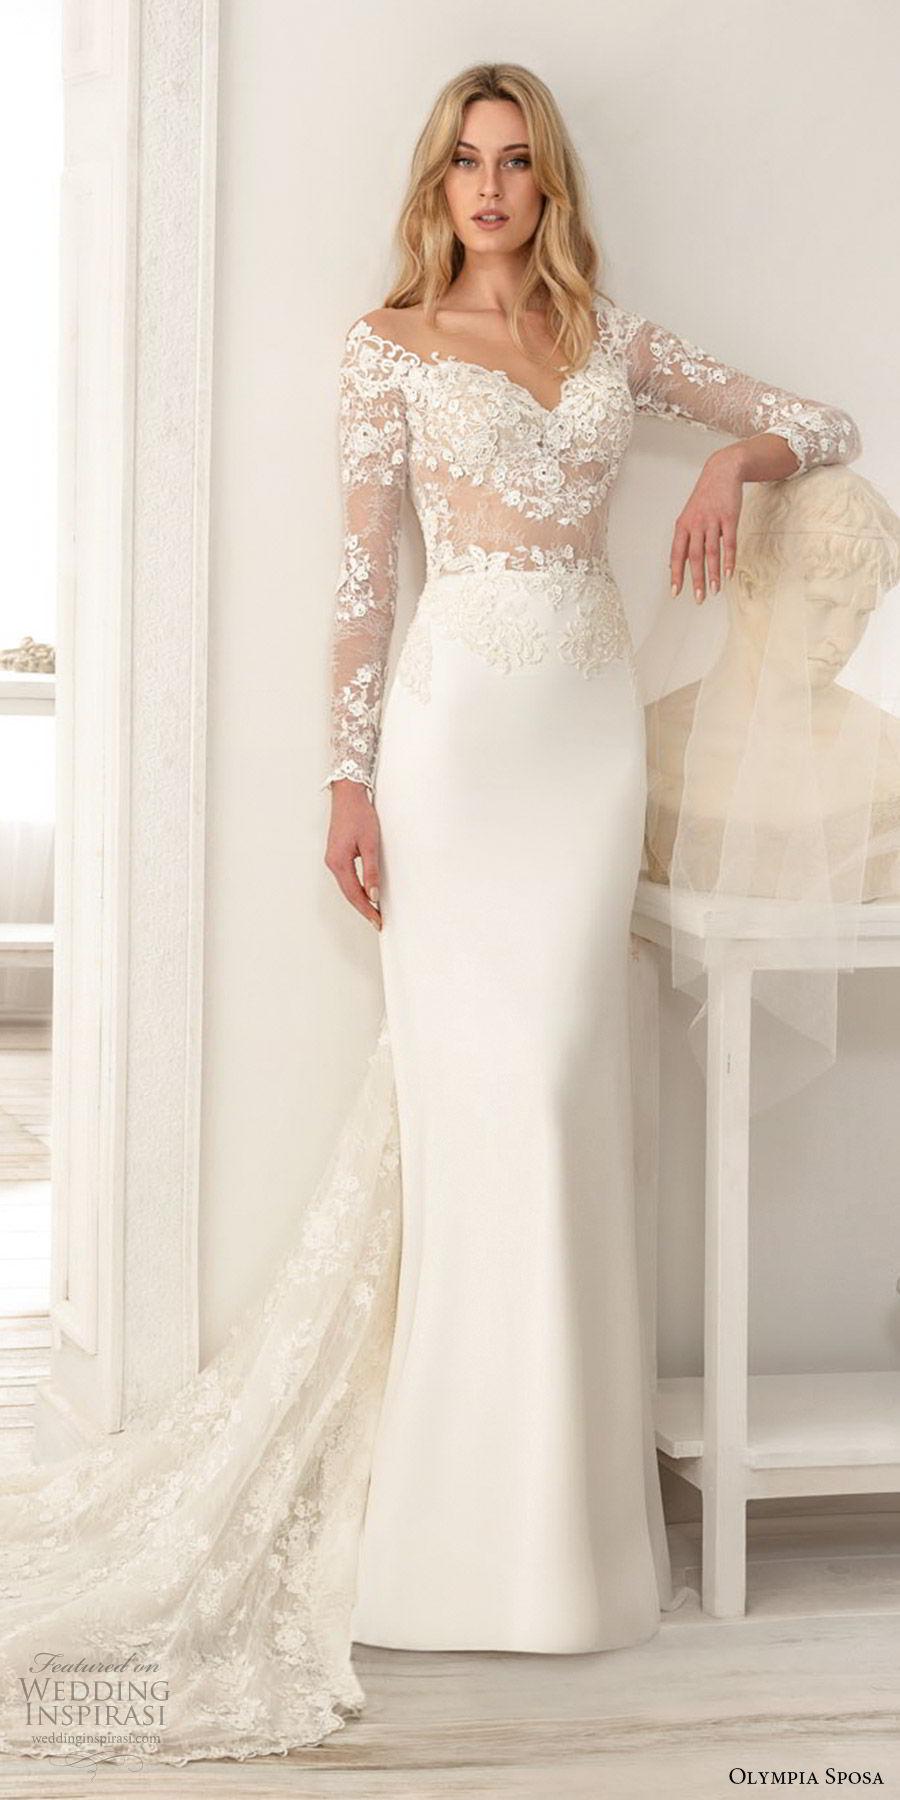 olympia sposa 2020 bridal illusion long sleeve off shoulder sweetheart sheer lace embellished bodice sheath wedding dress (2) elegant romantic chapel train mv